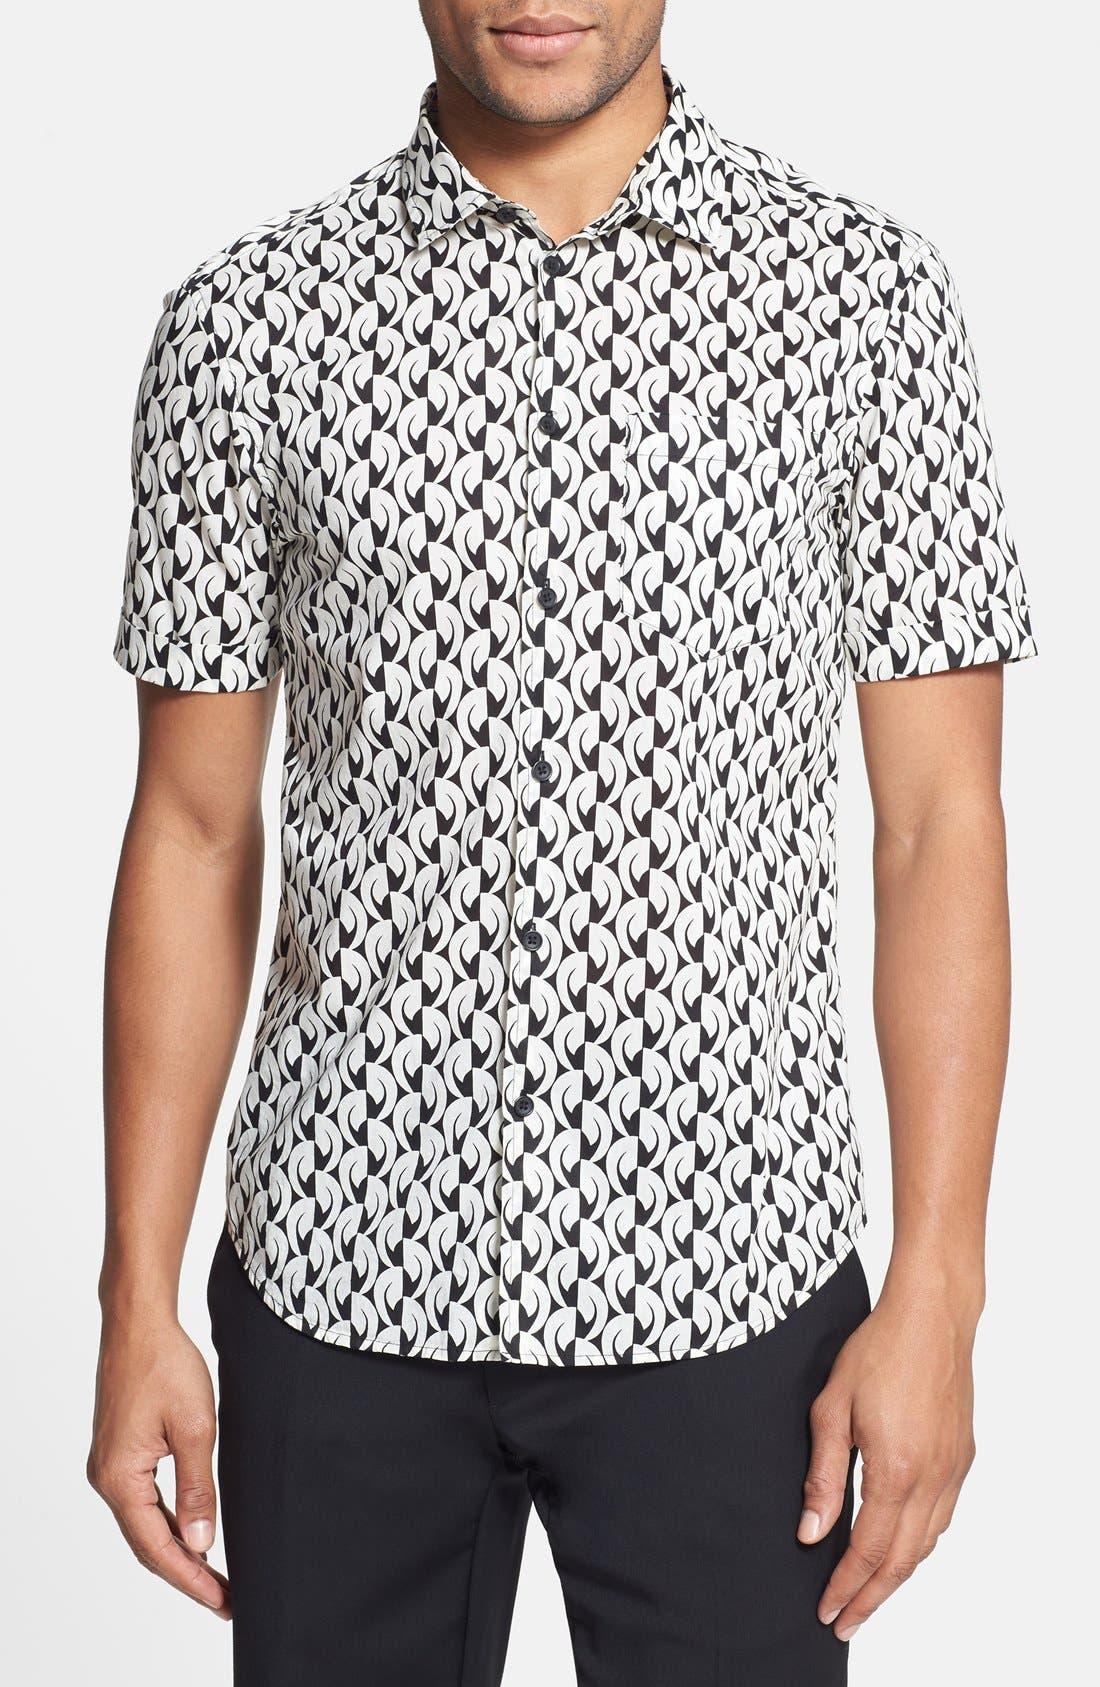 Alternate Image 1 Selected - MARC BY MARC JACOBS 'Bellflower' Print Short Sleeve Sport Shirt